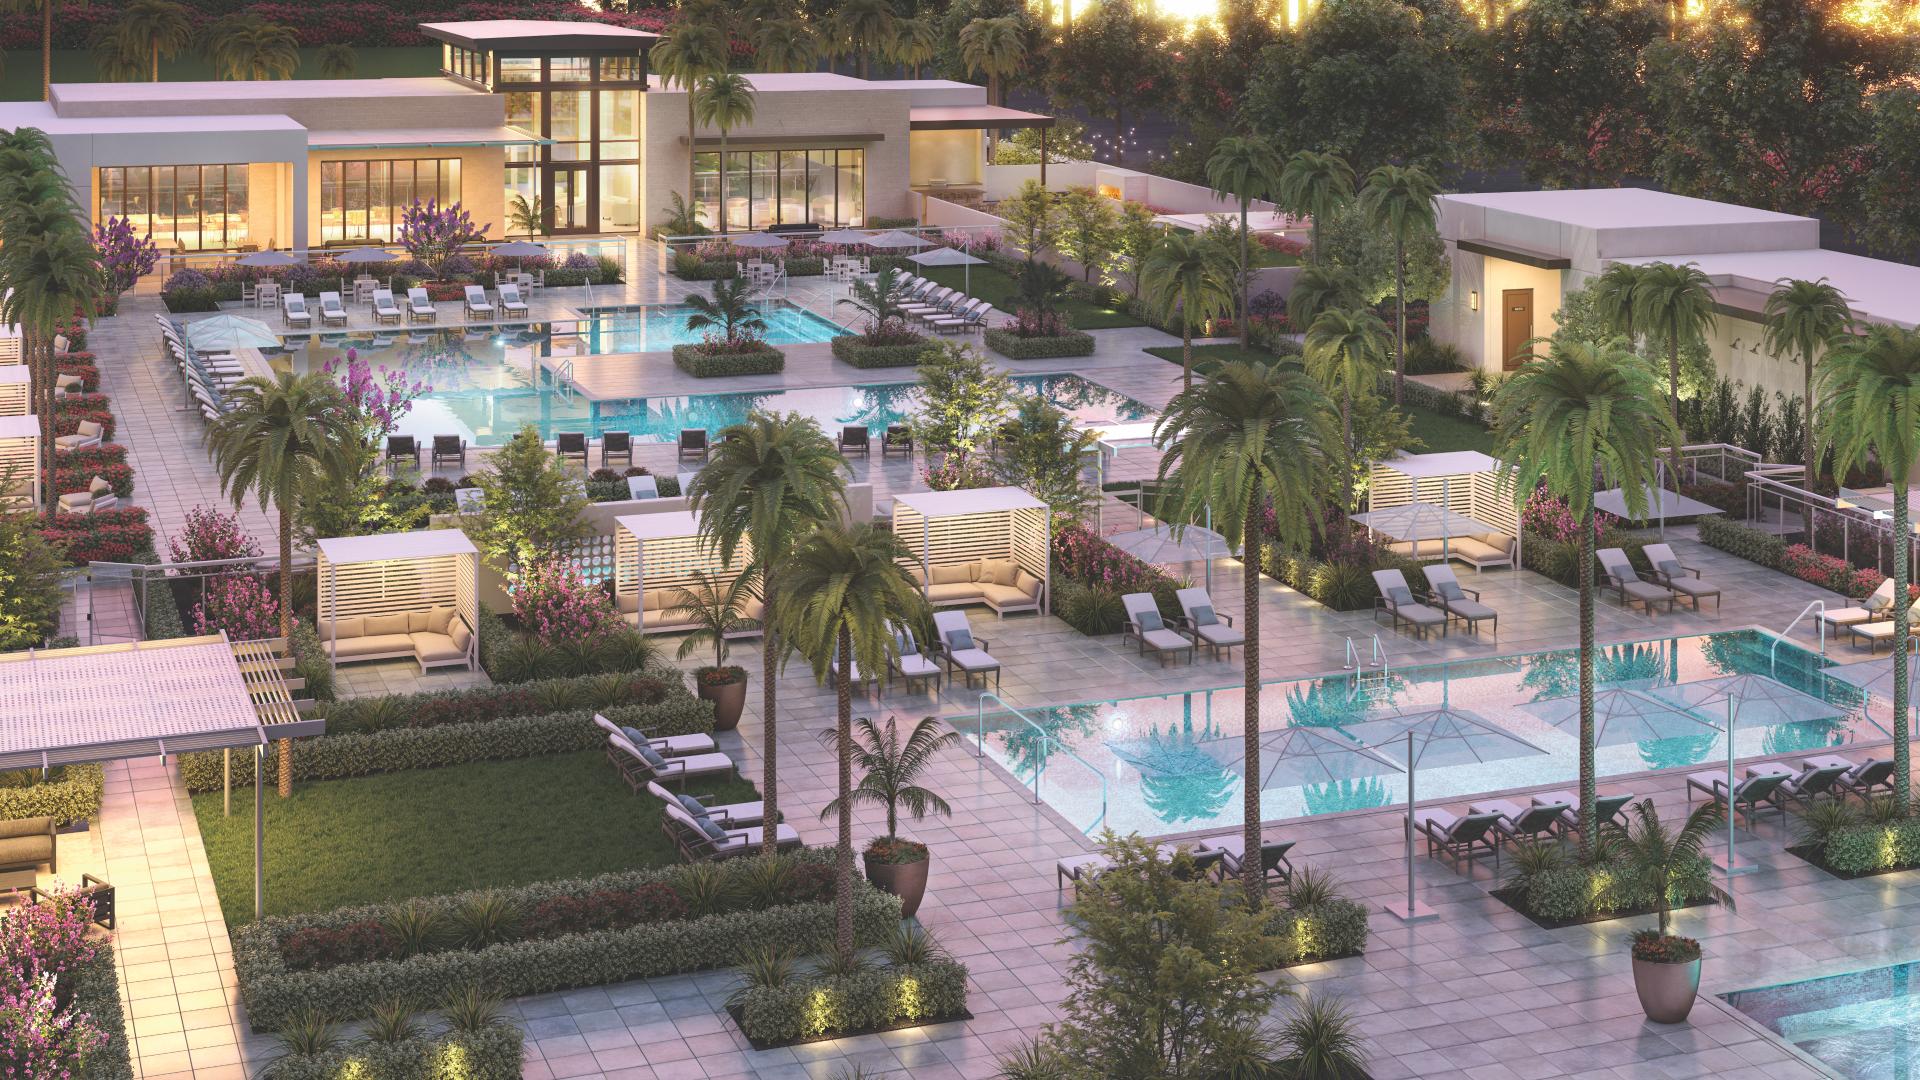 Resort-style recreation center